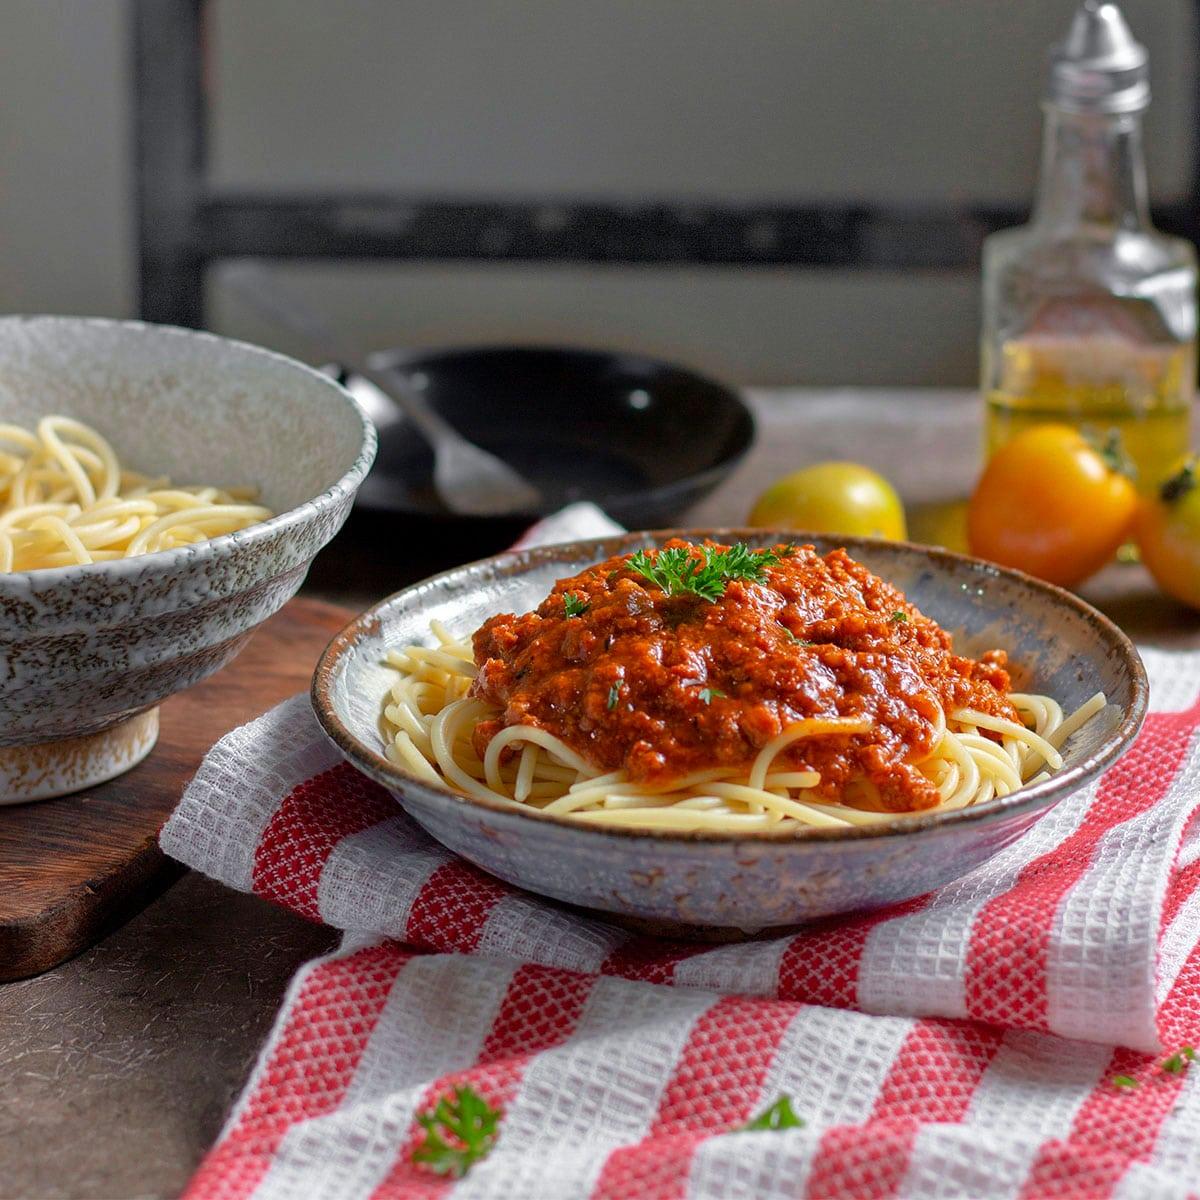 Spaghetti bolognaise aux courgettes invisibles